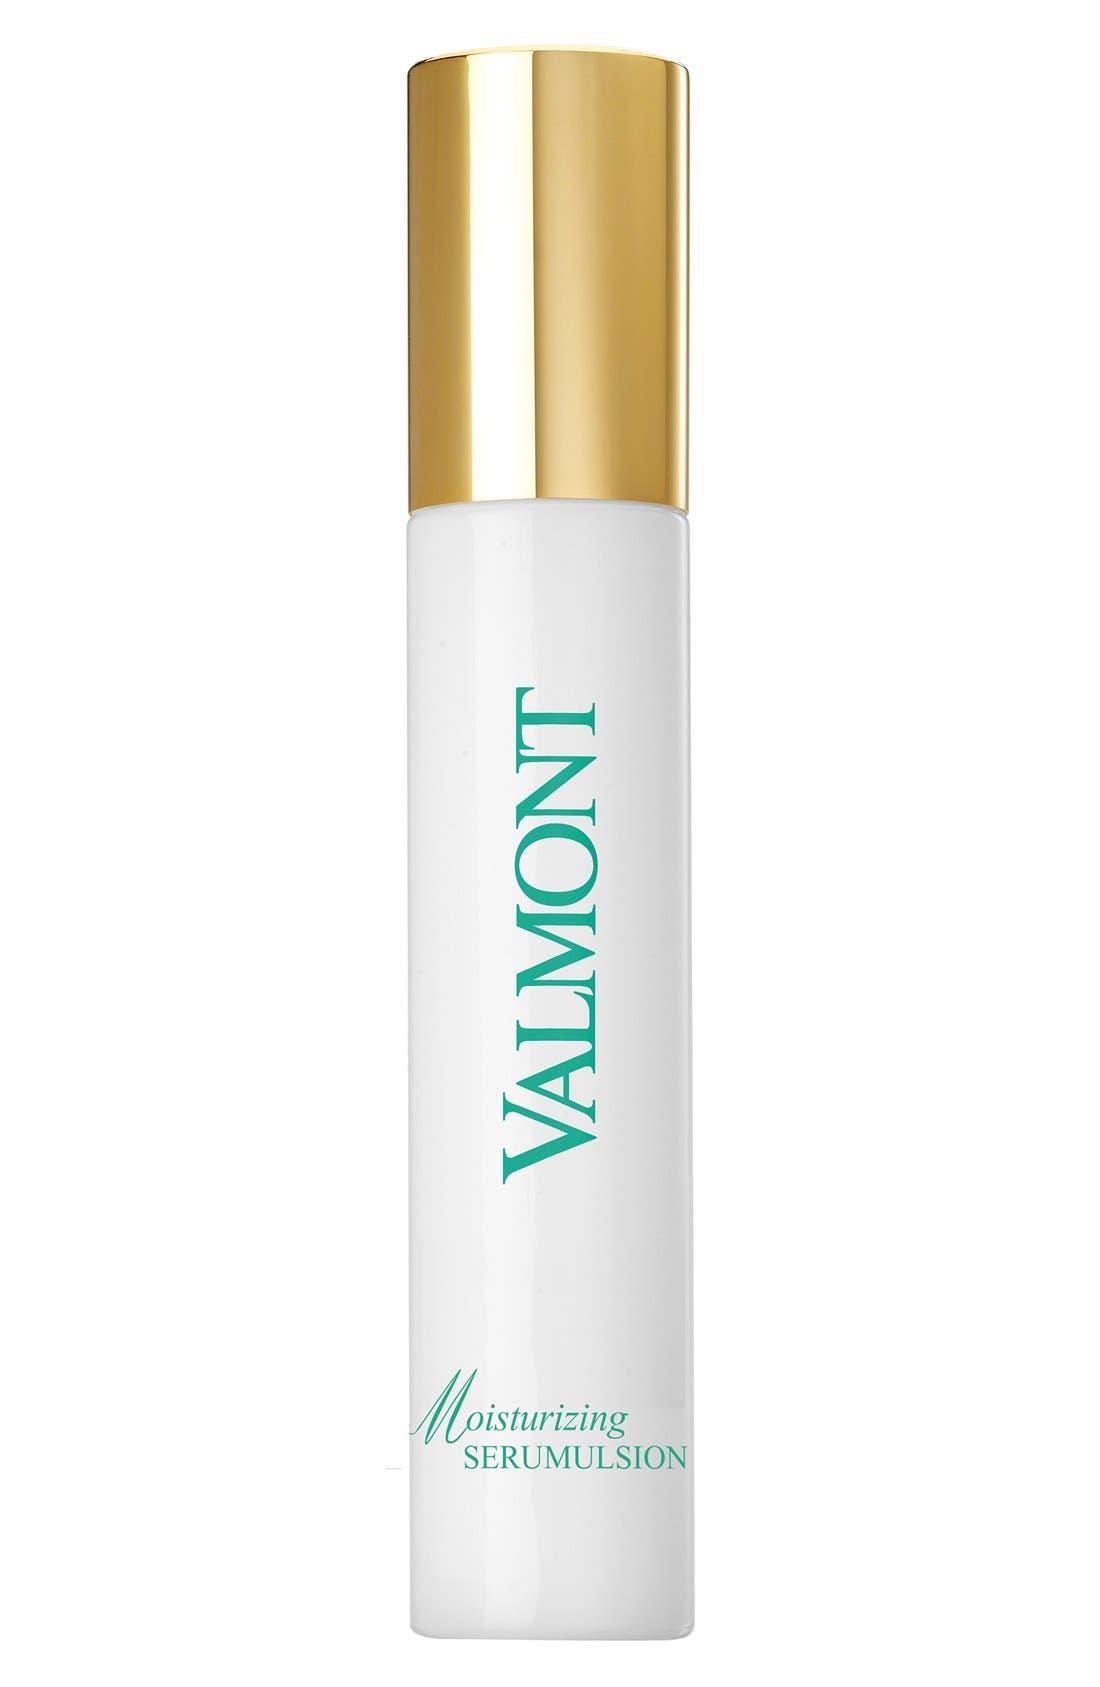 Valmont Moisturizing Serumulsion